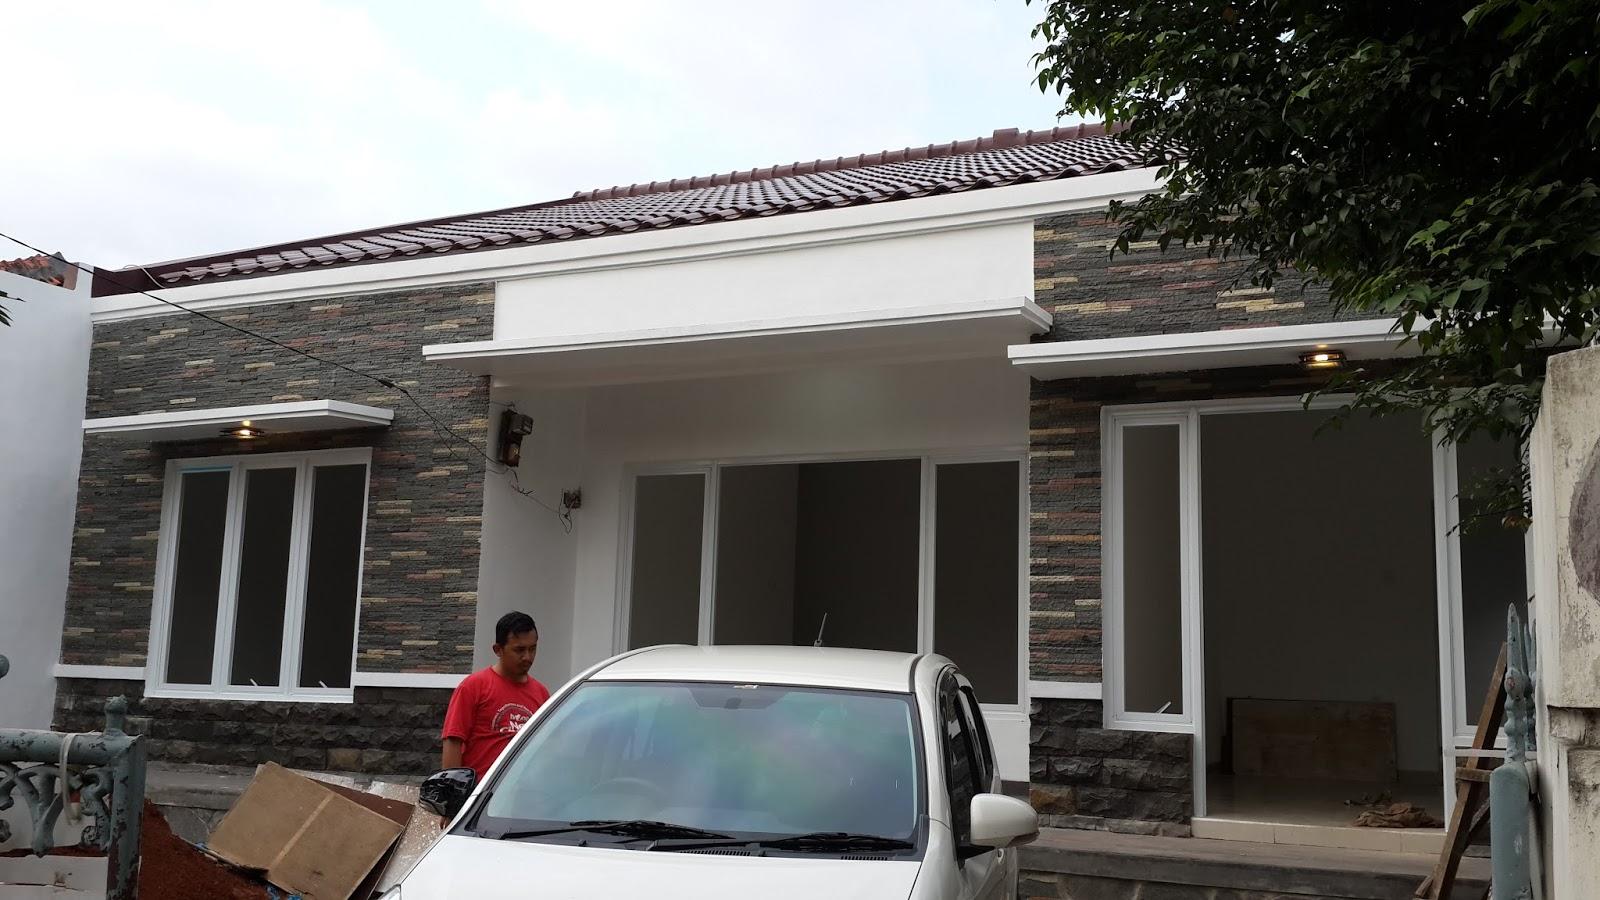 Renovasi Rumah Minimalis Murah Baitizania  JASA RENOVASI RUMAH  AHLINYA RENOVASI RUMAH